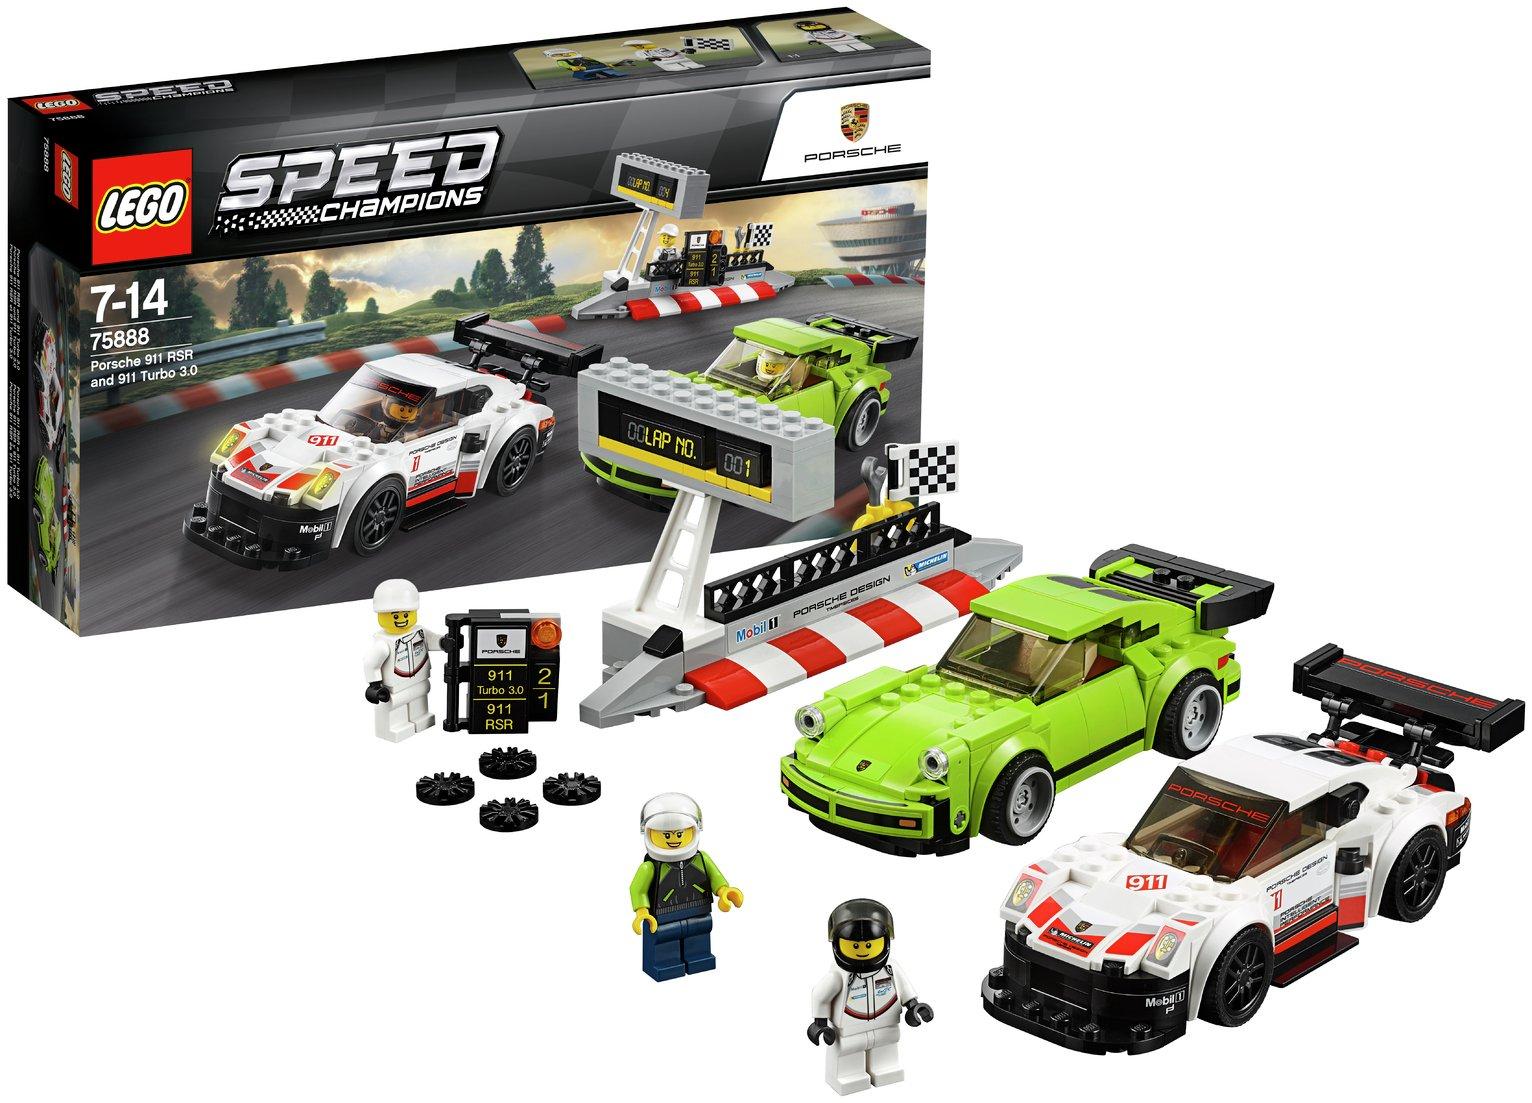 Image of LEGO Speed Champions Porsche 911 RSR & 911 TURBO 3.0 - 75888